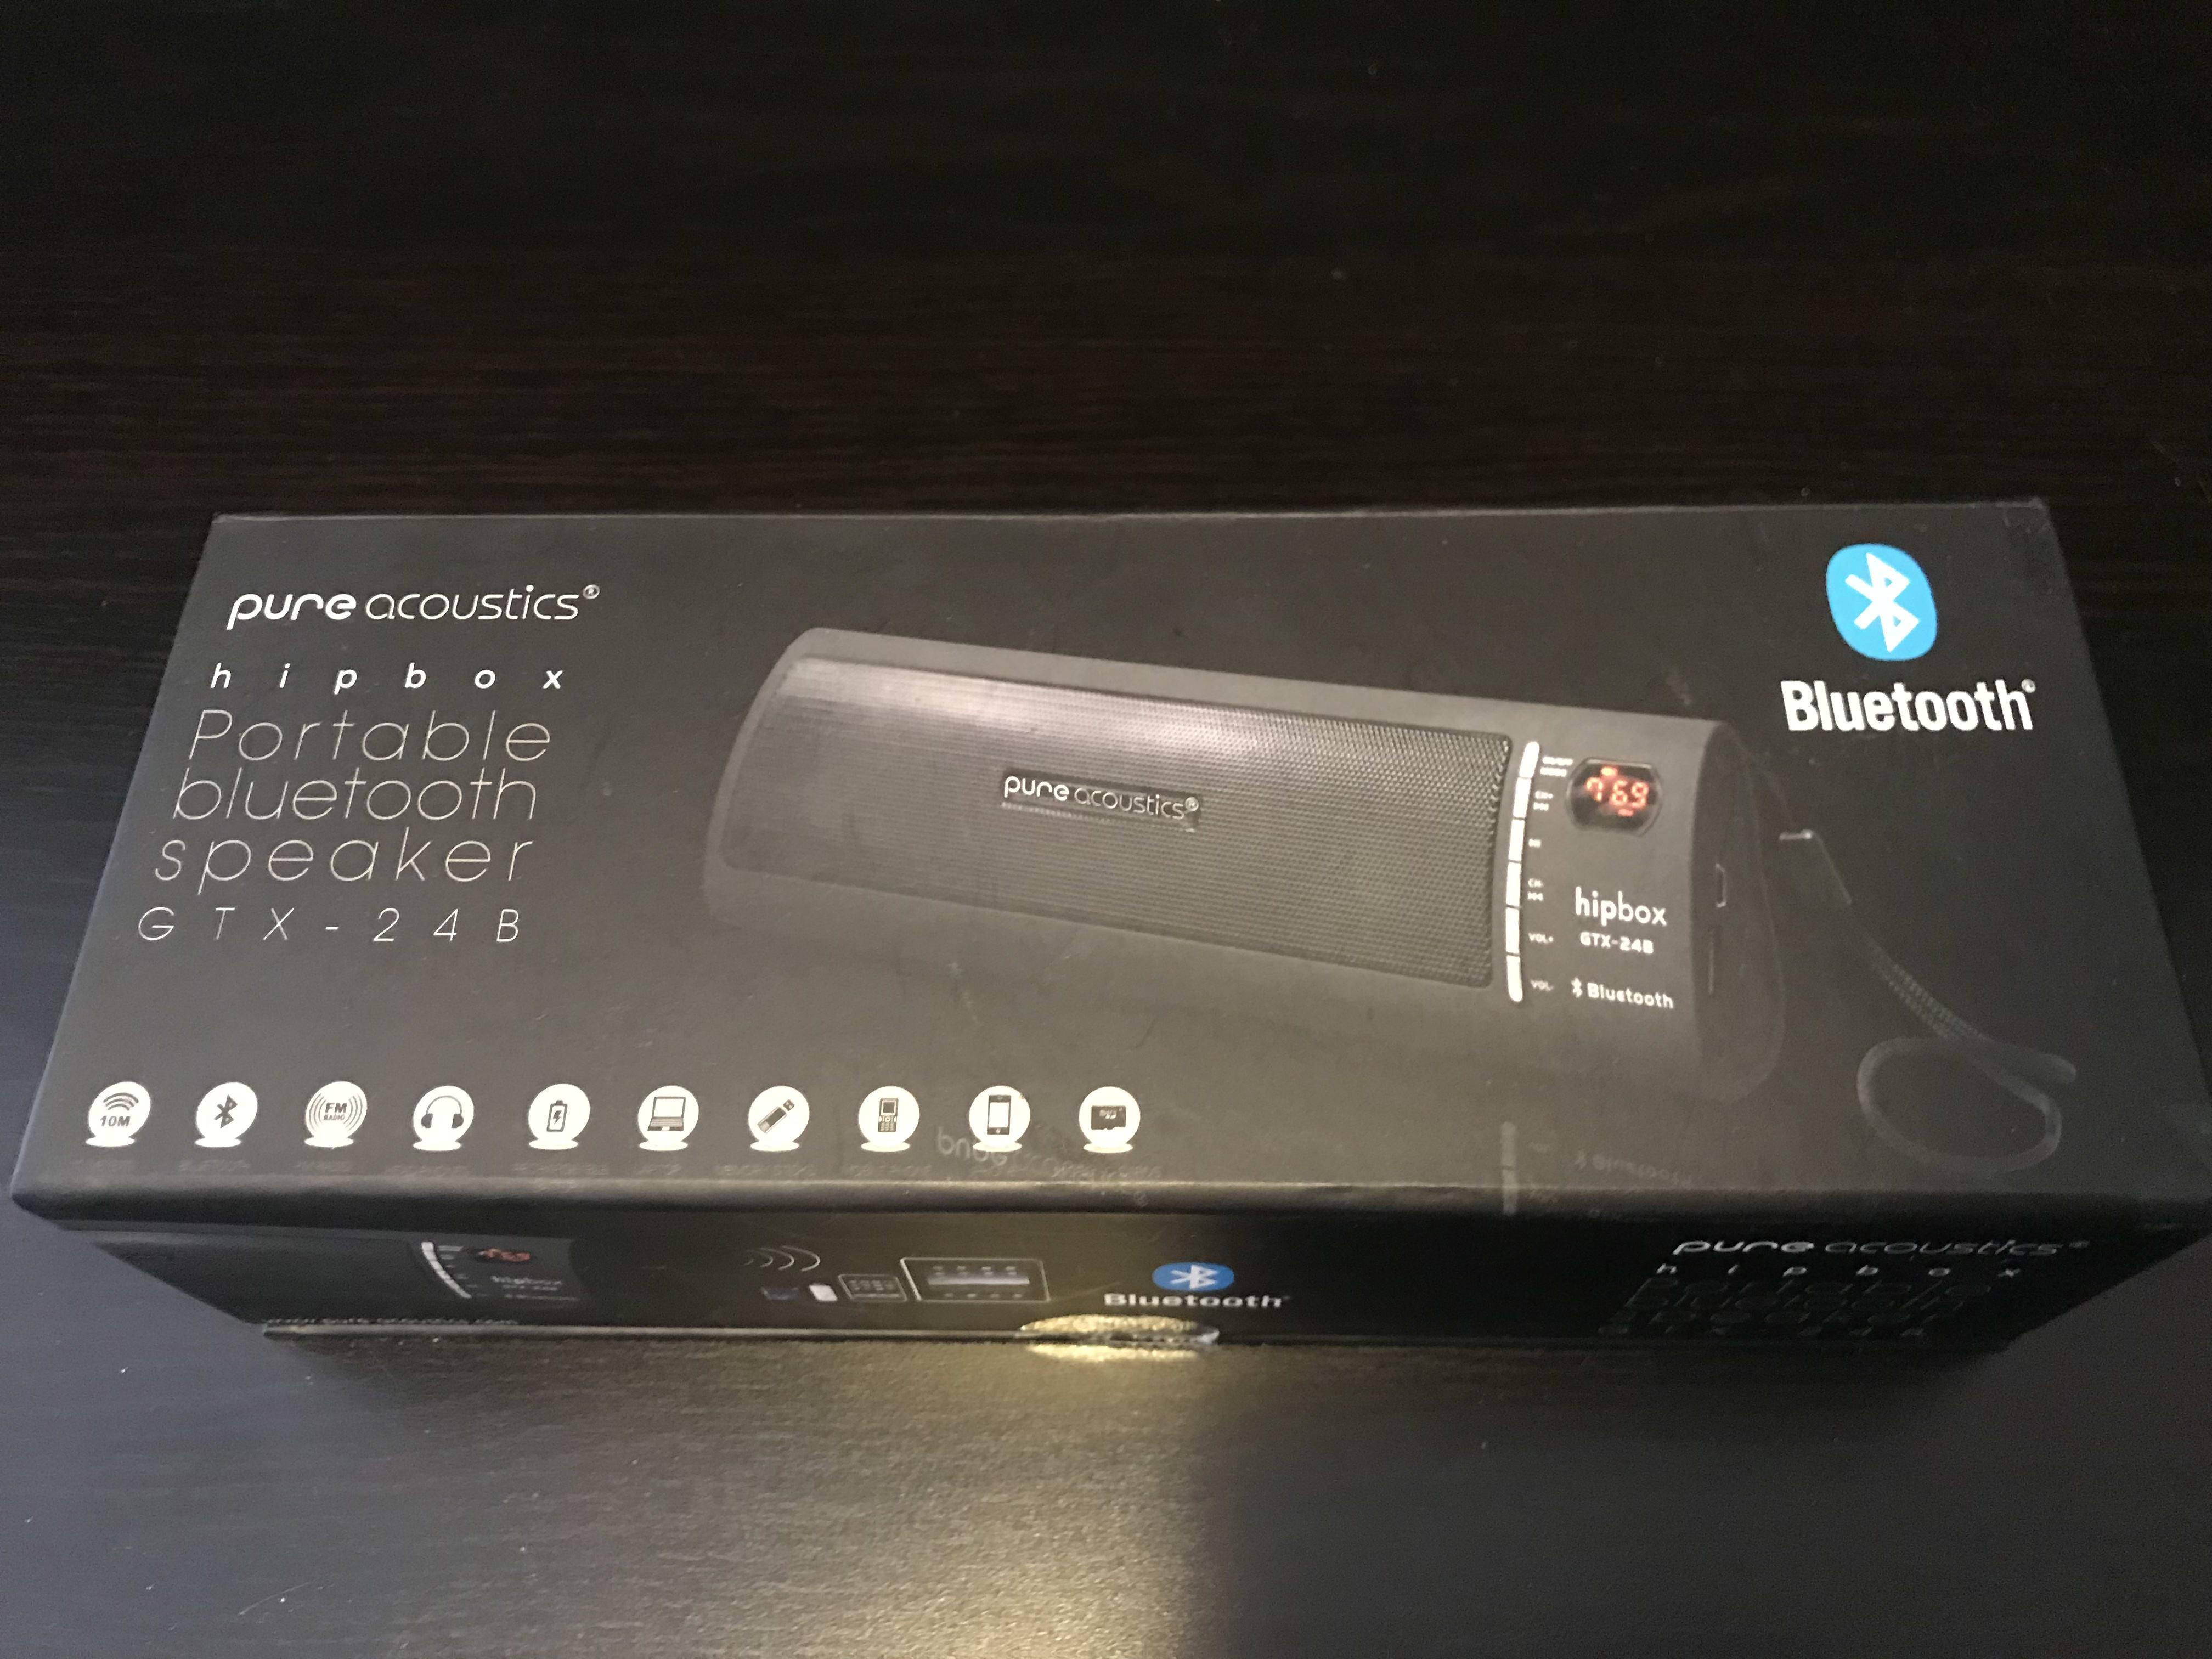 Picture 1 for Pure acoustics hipbox portable bluetooth speaker GTX - 24B